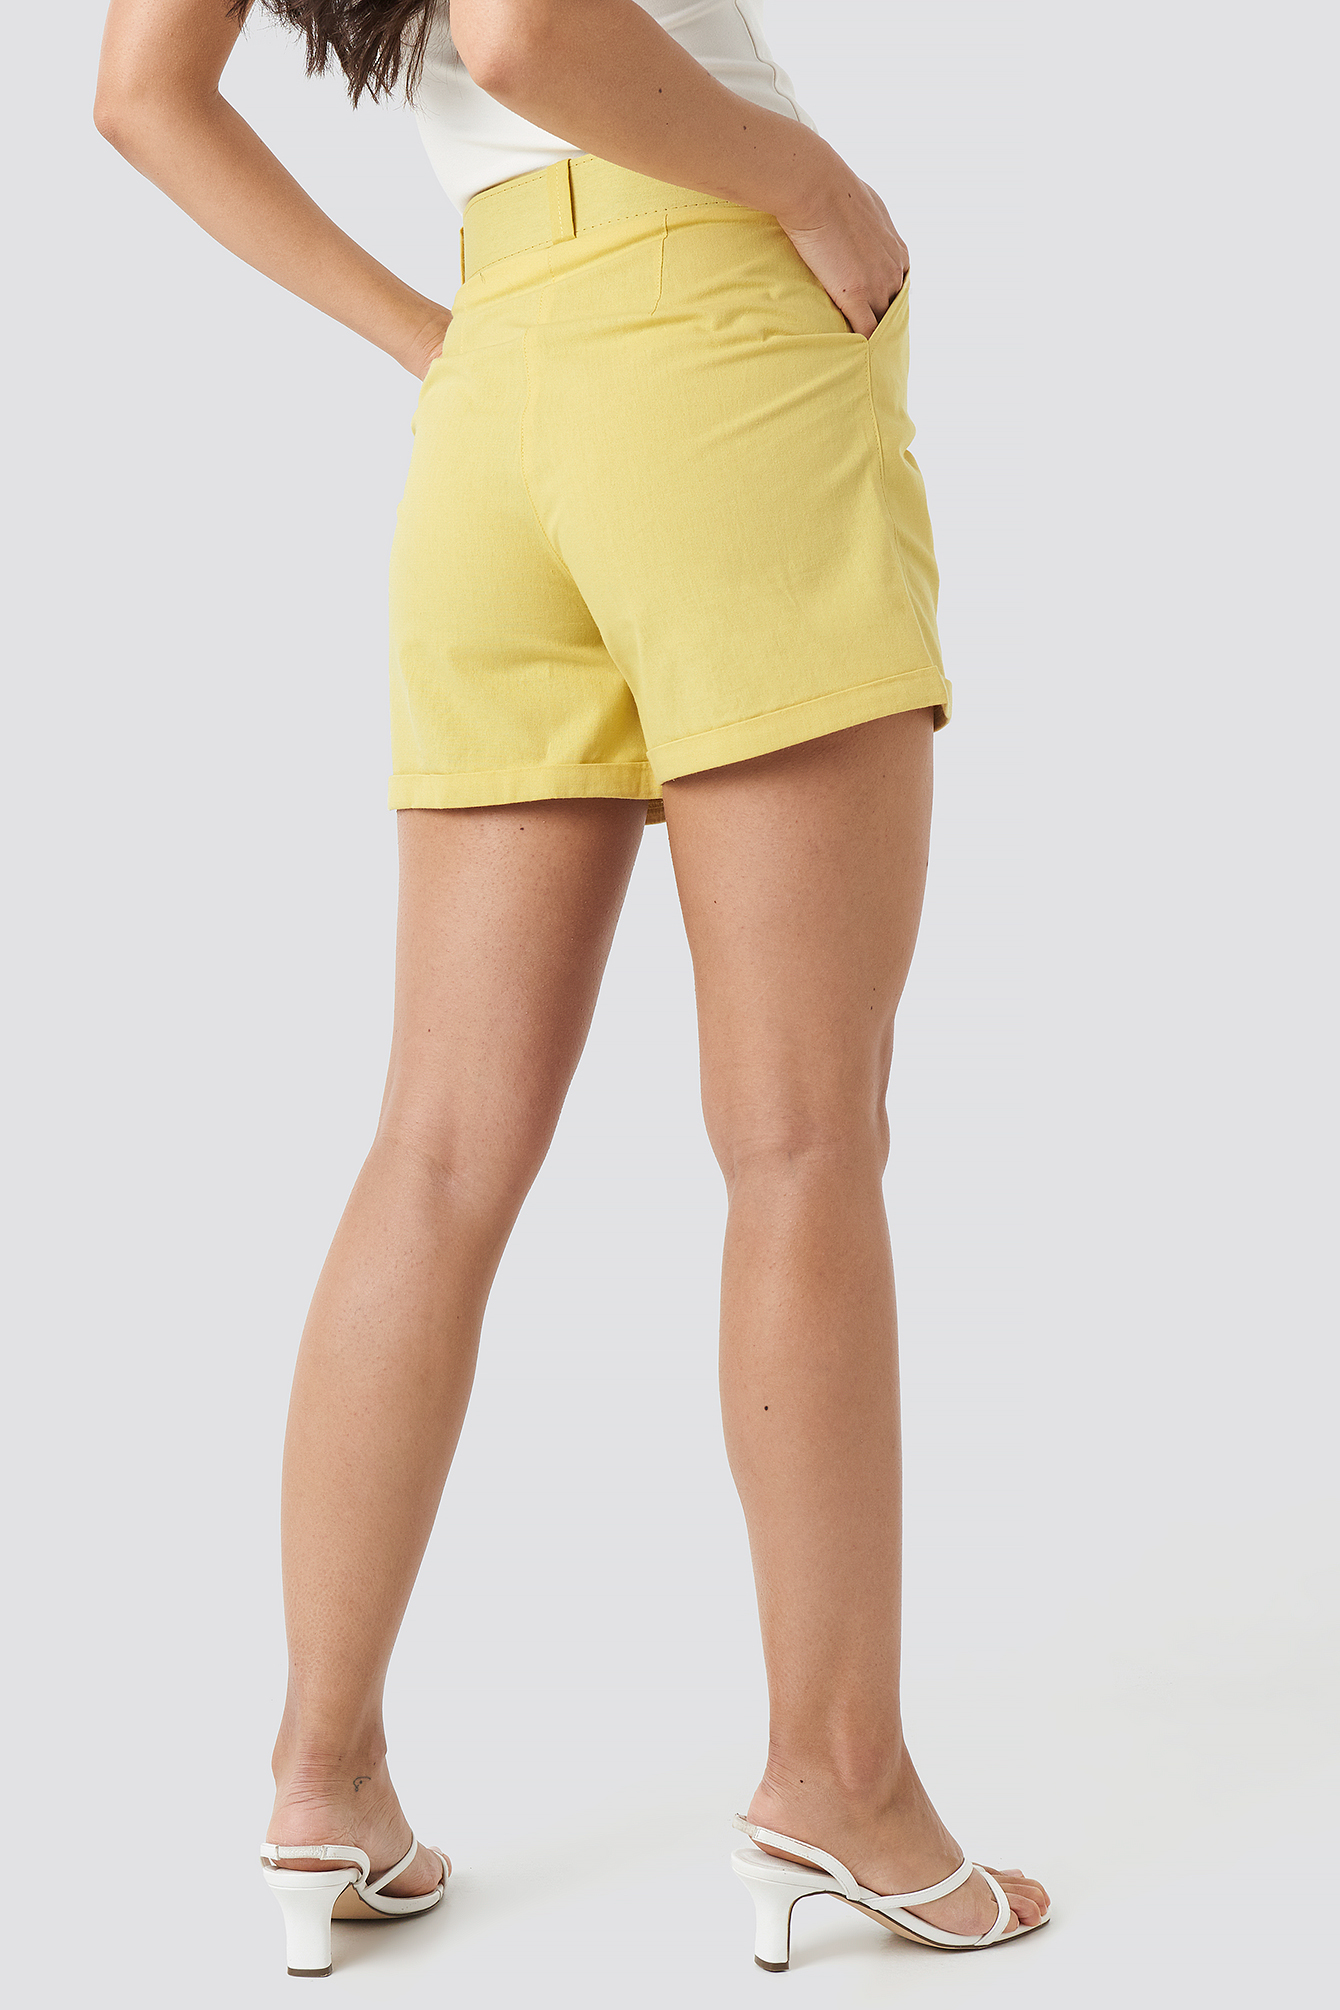 Yol Belt Detailed Shorts NA-KD.COM